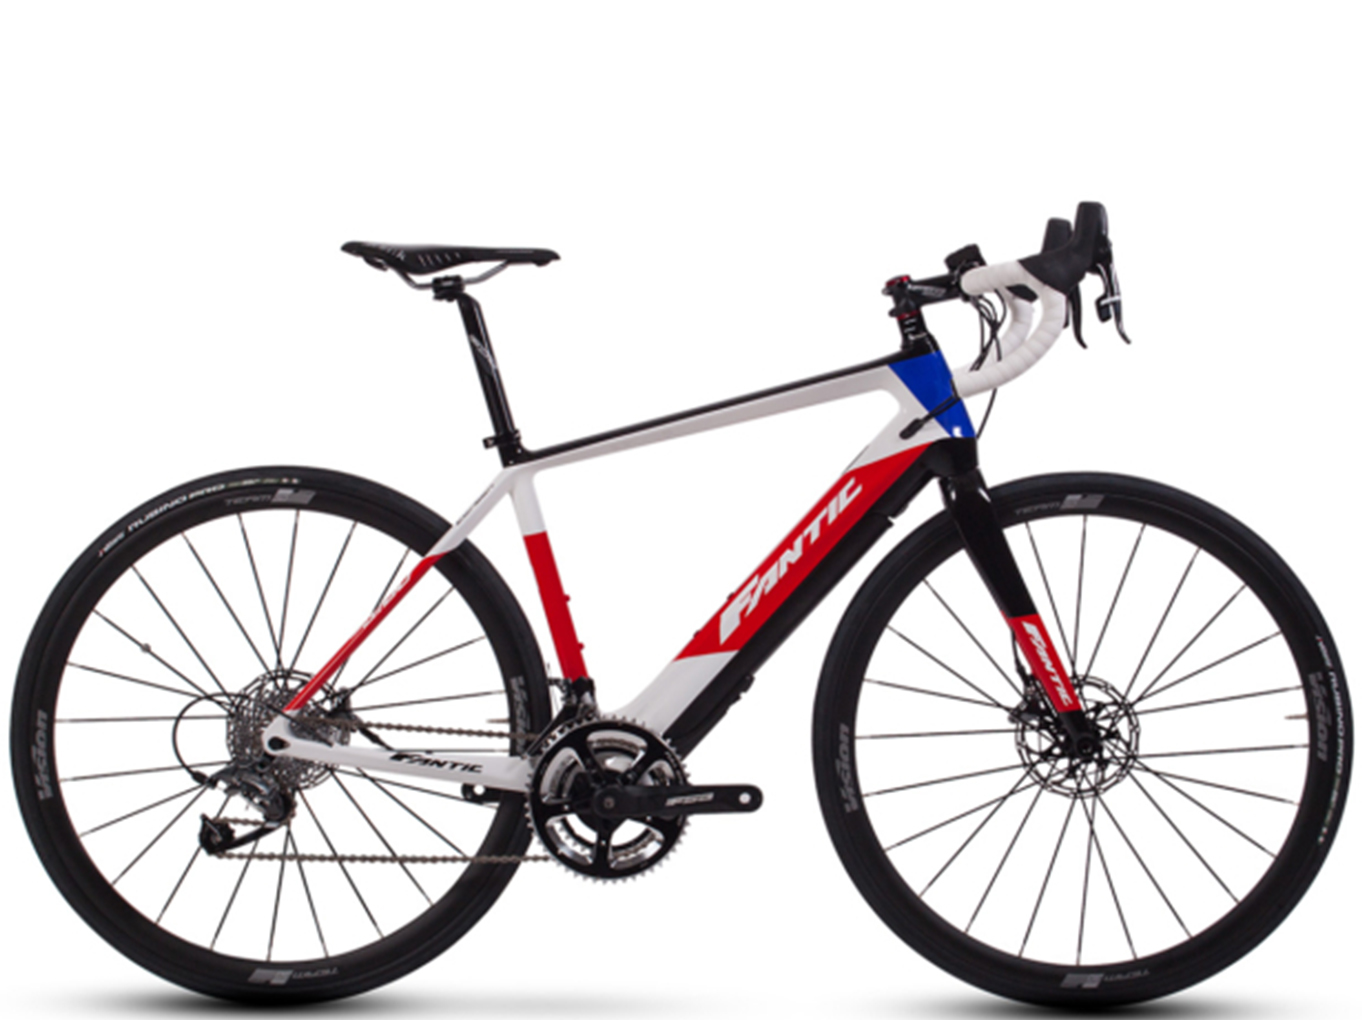 Foto de la bicicleta eléctrica marca Fantic